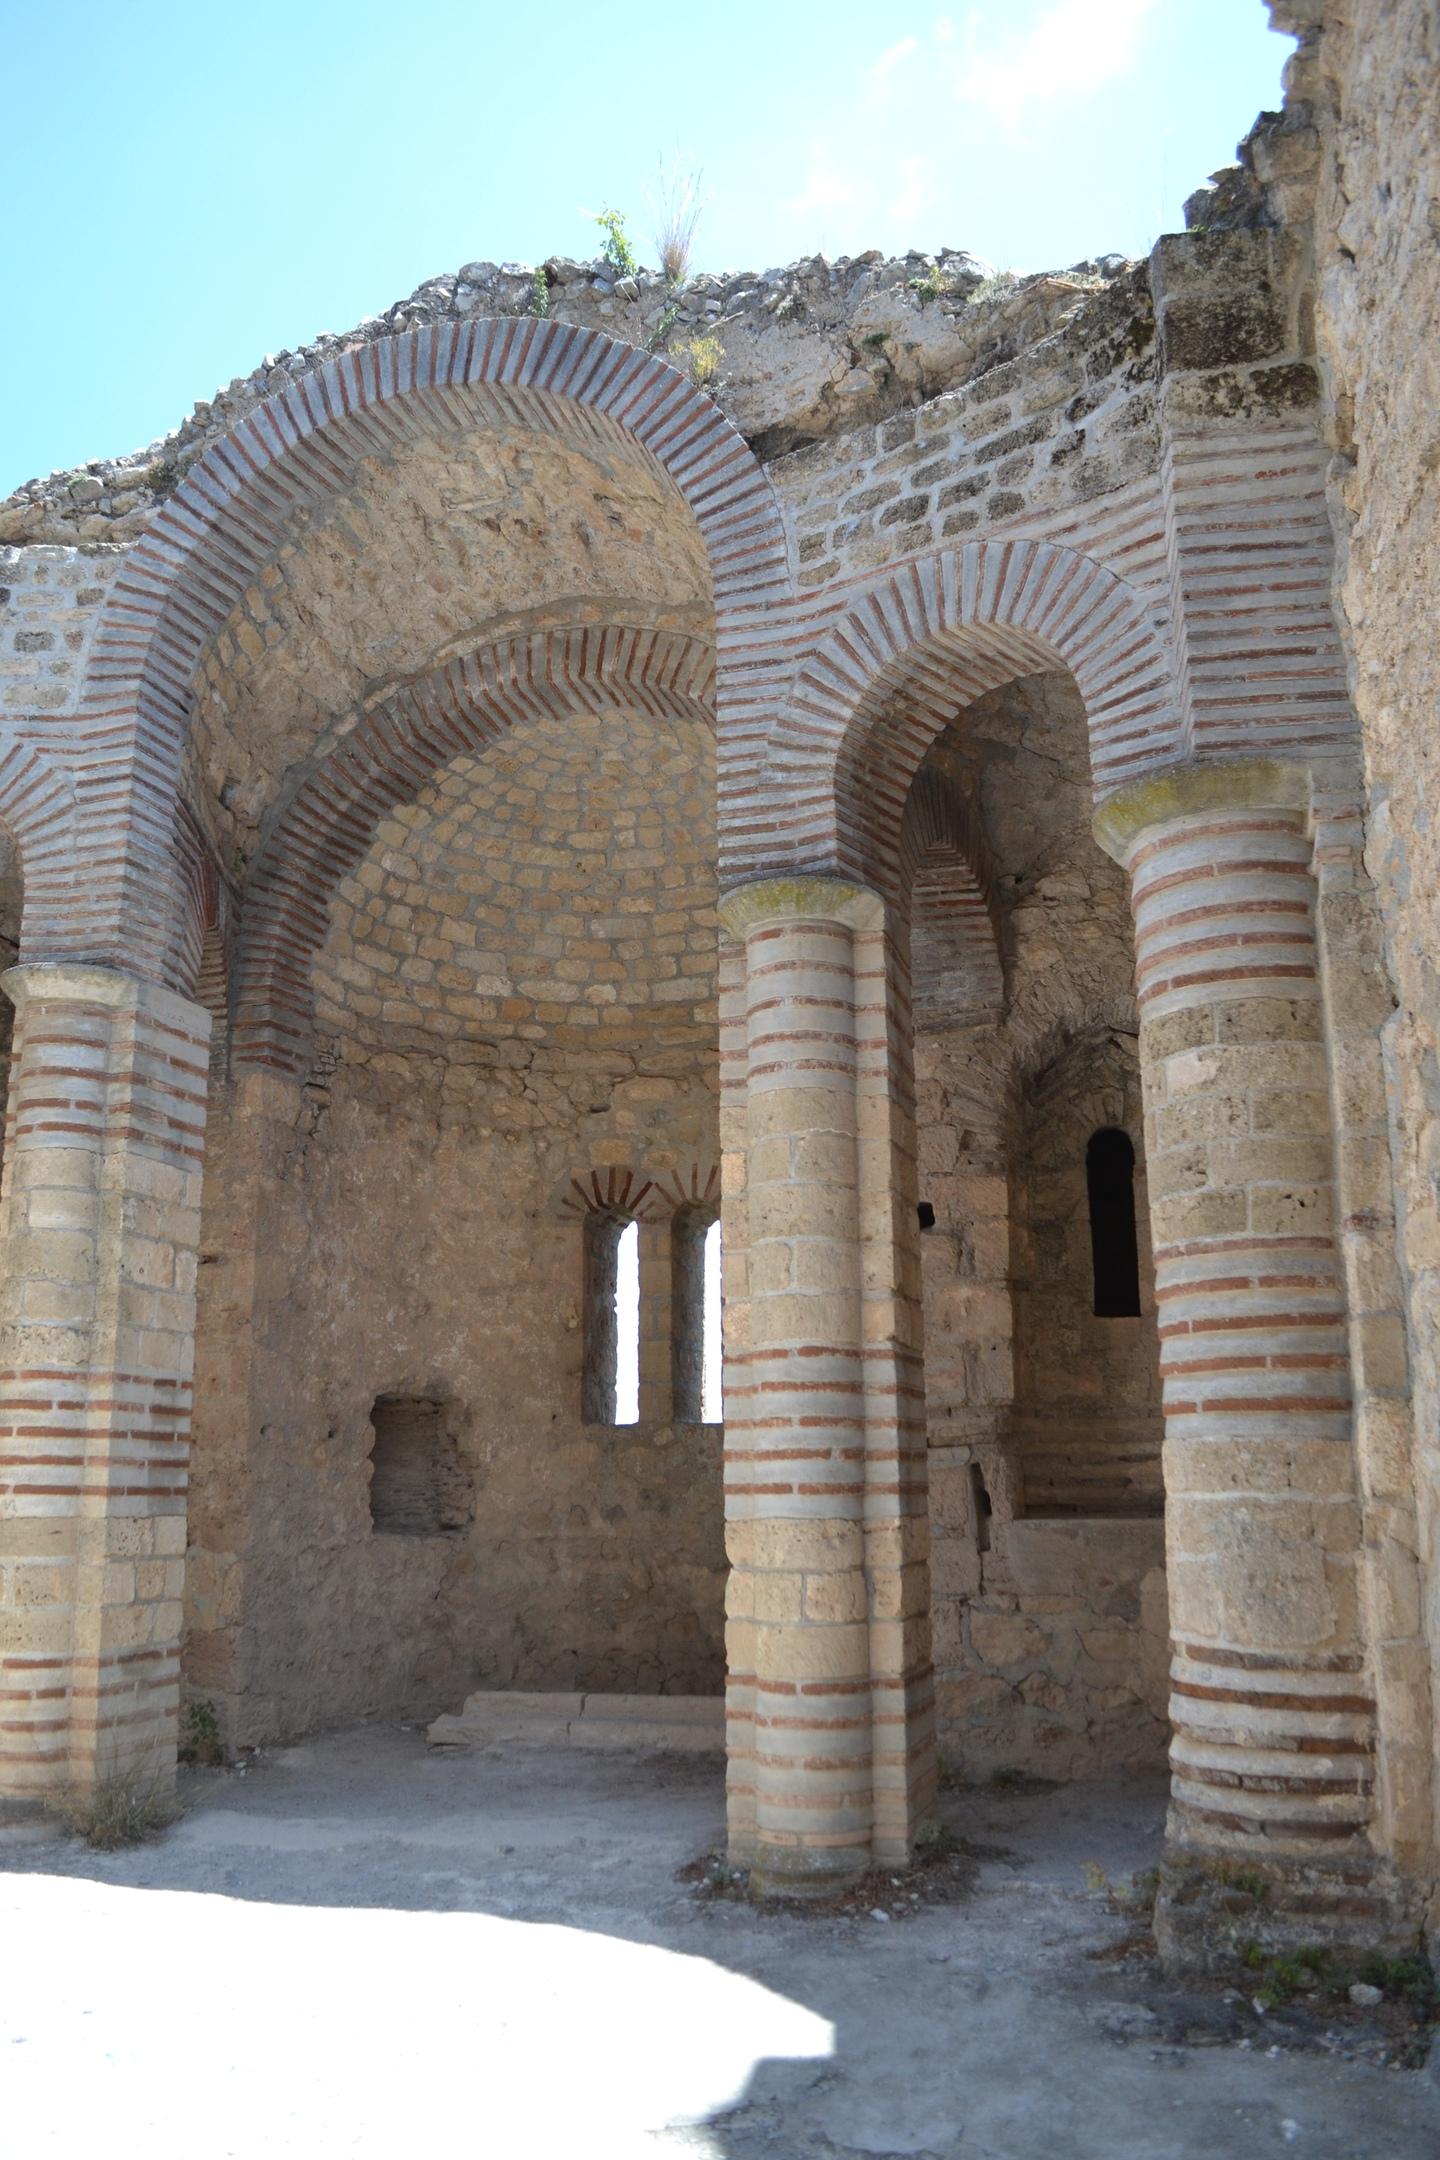 Северный Кипр. Замок Святого Иллариона. (фото). - Страница 2 51flWvwq1Oo